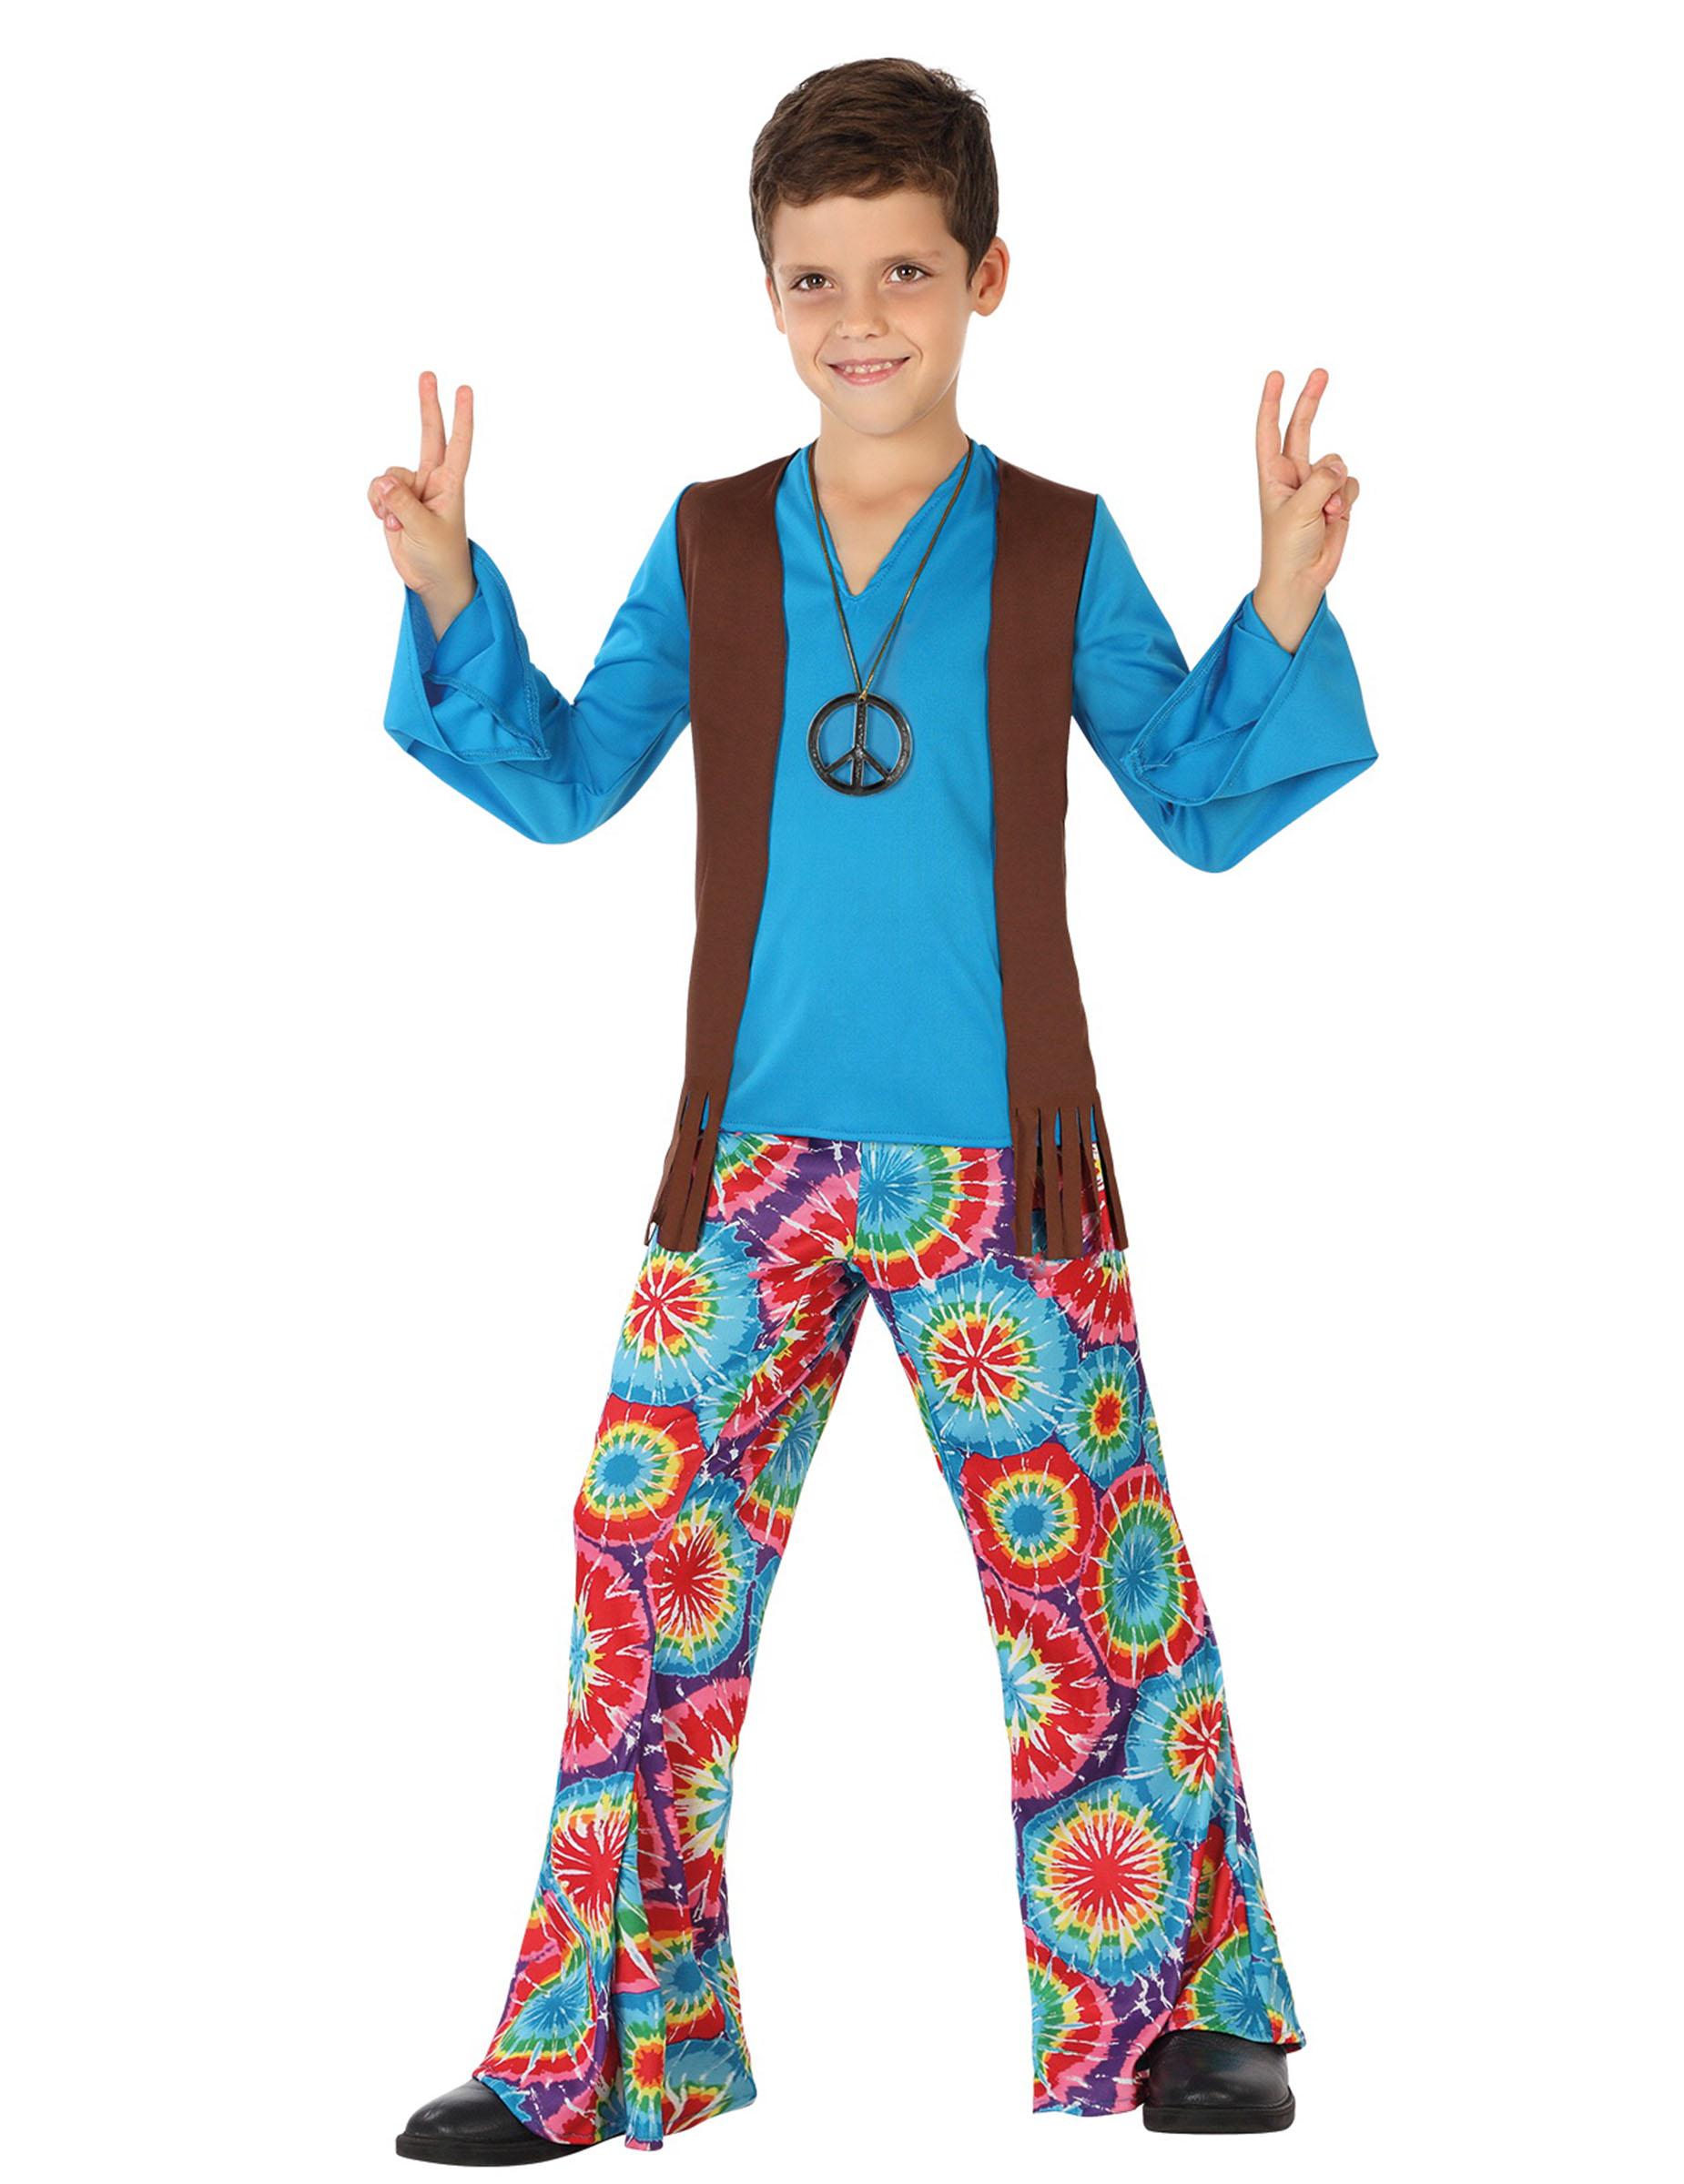 disfraces para ninos anos 60